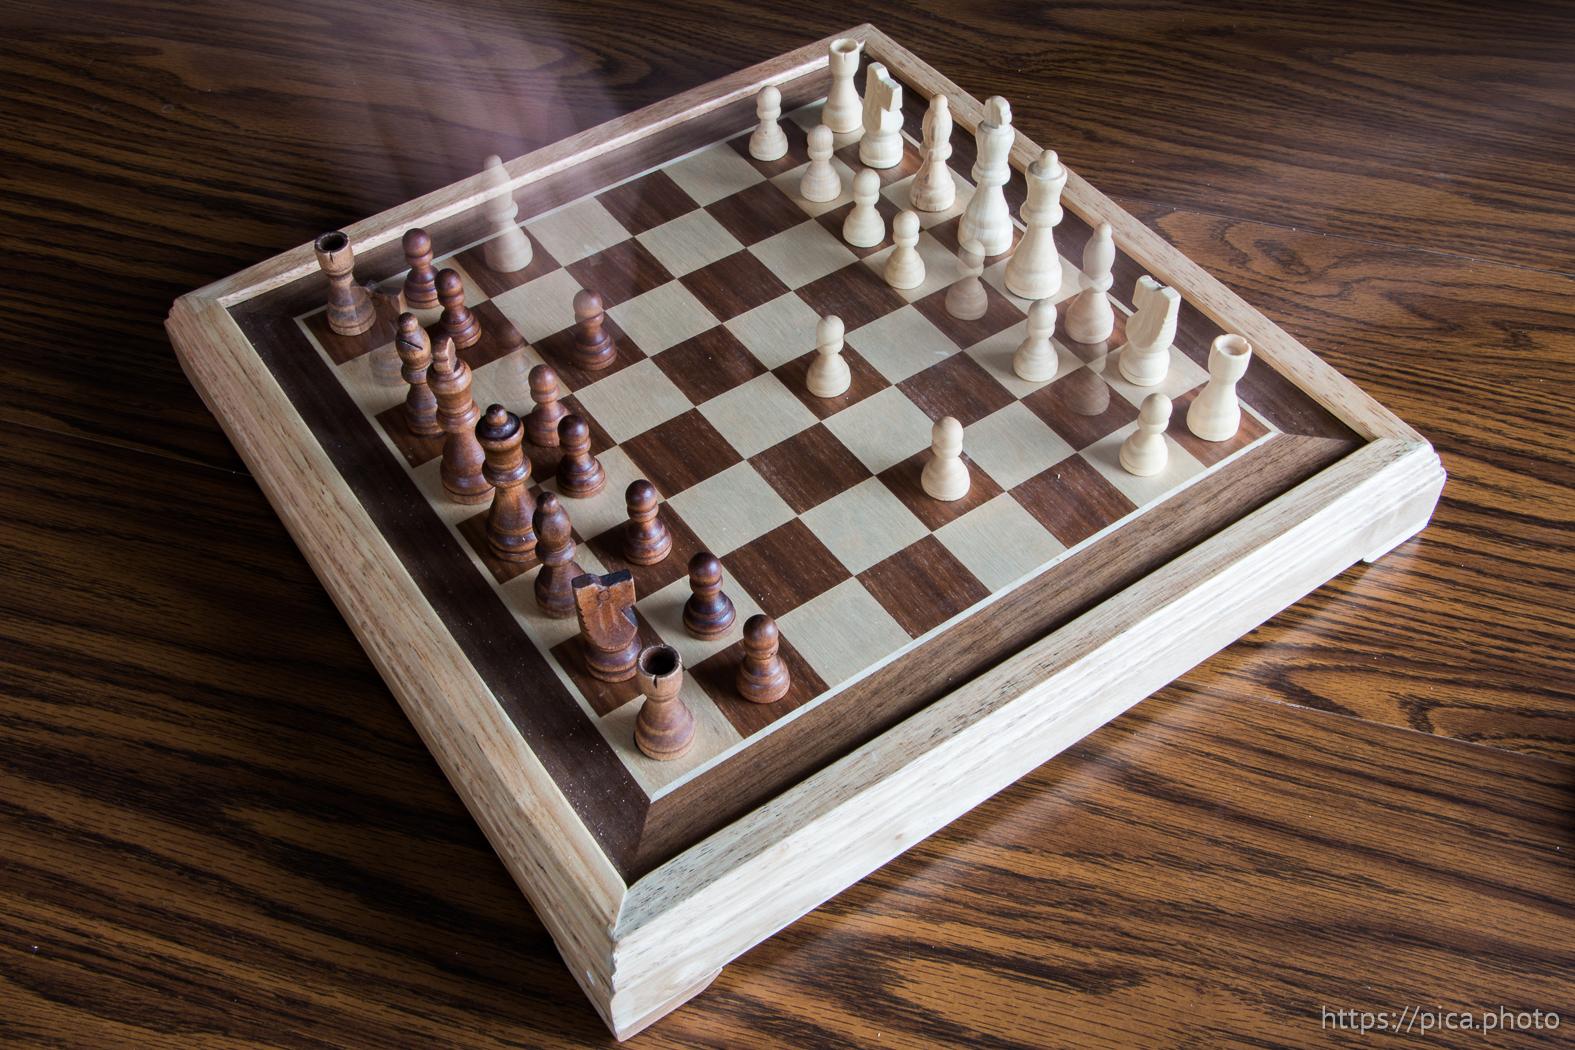 Chess board